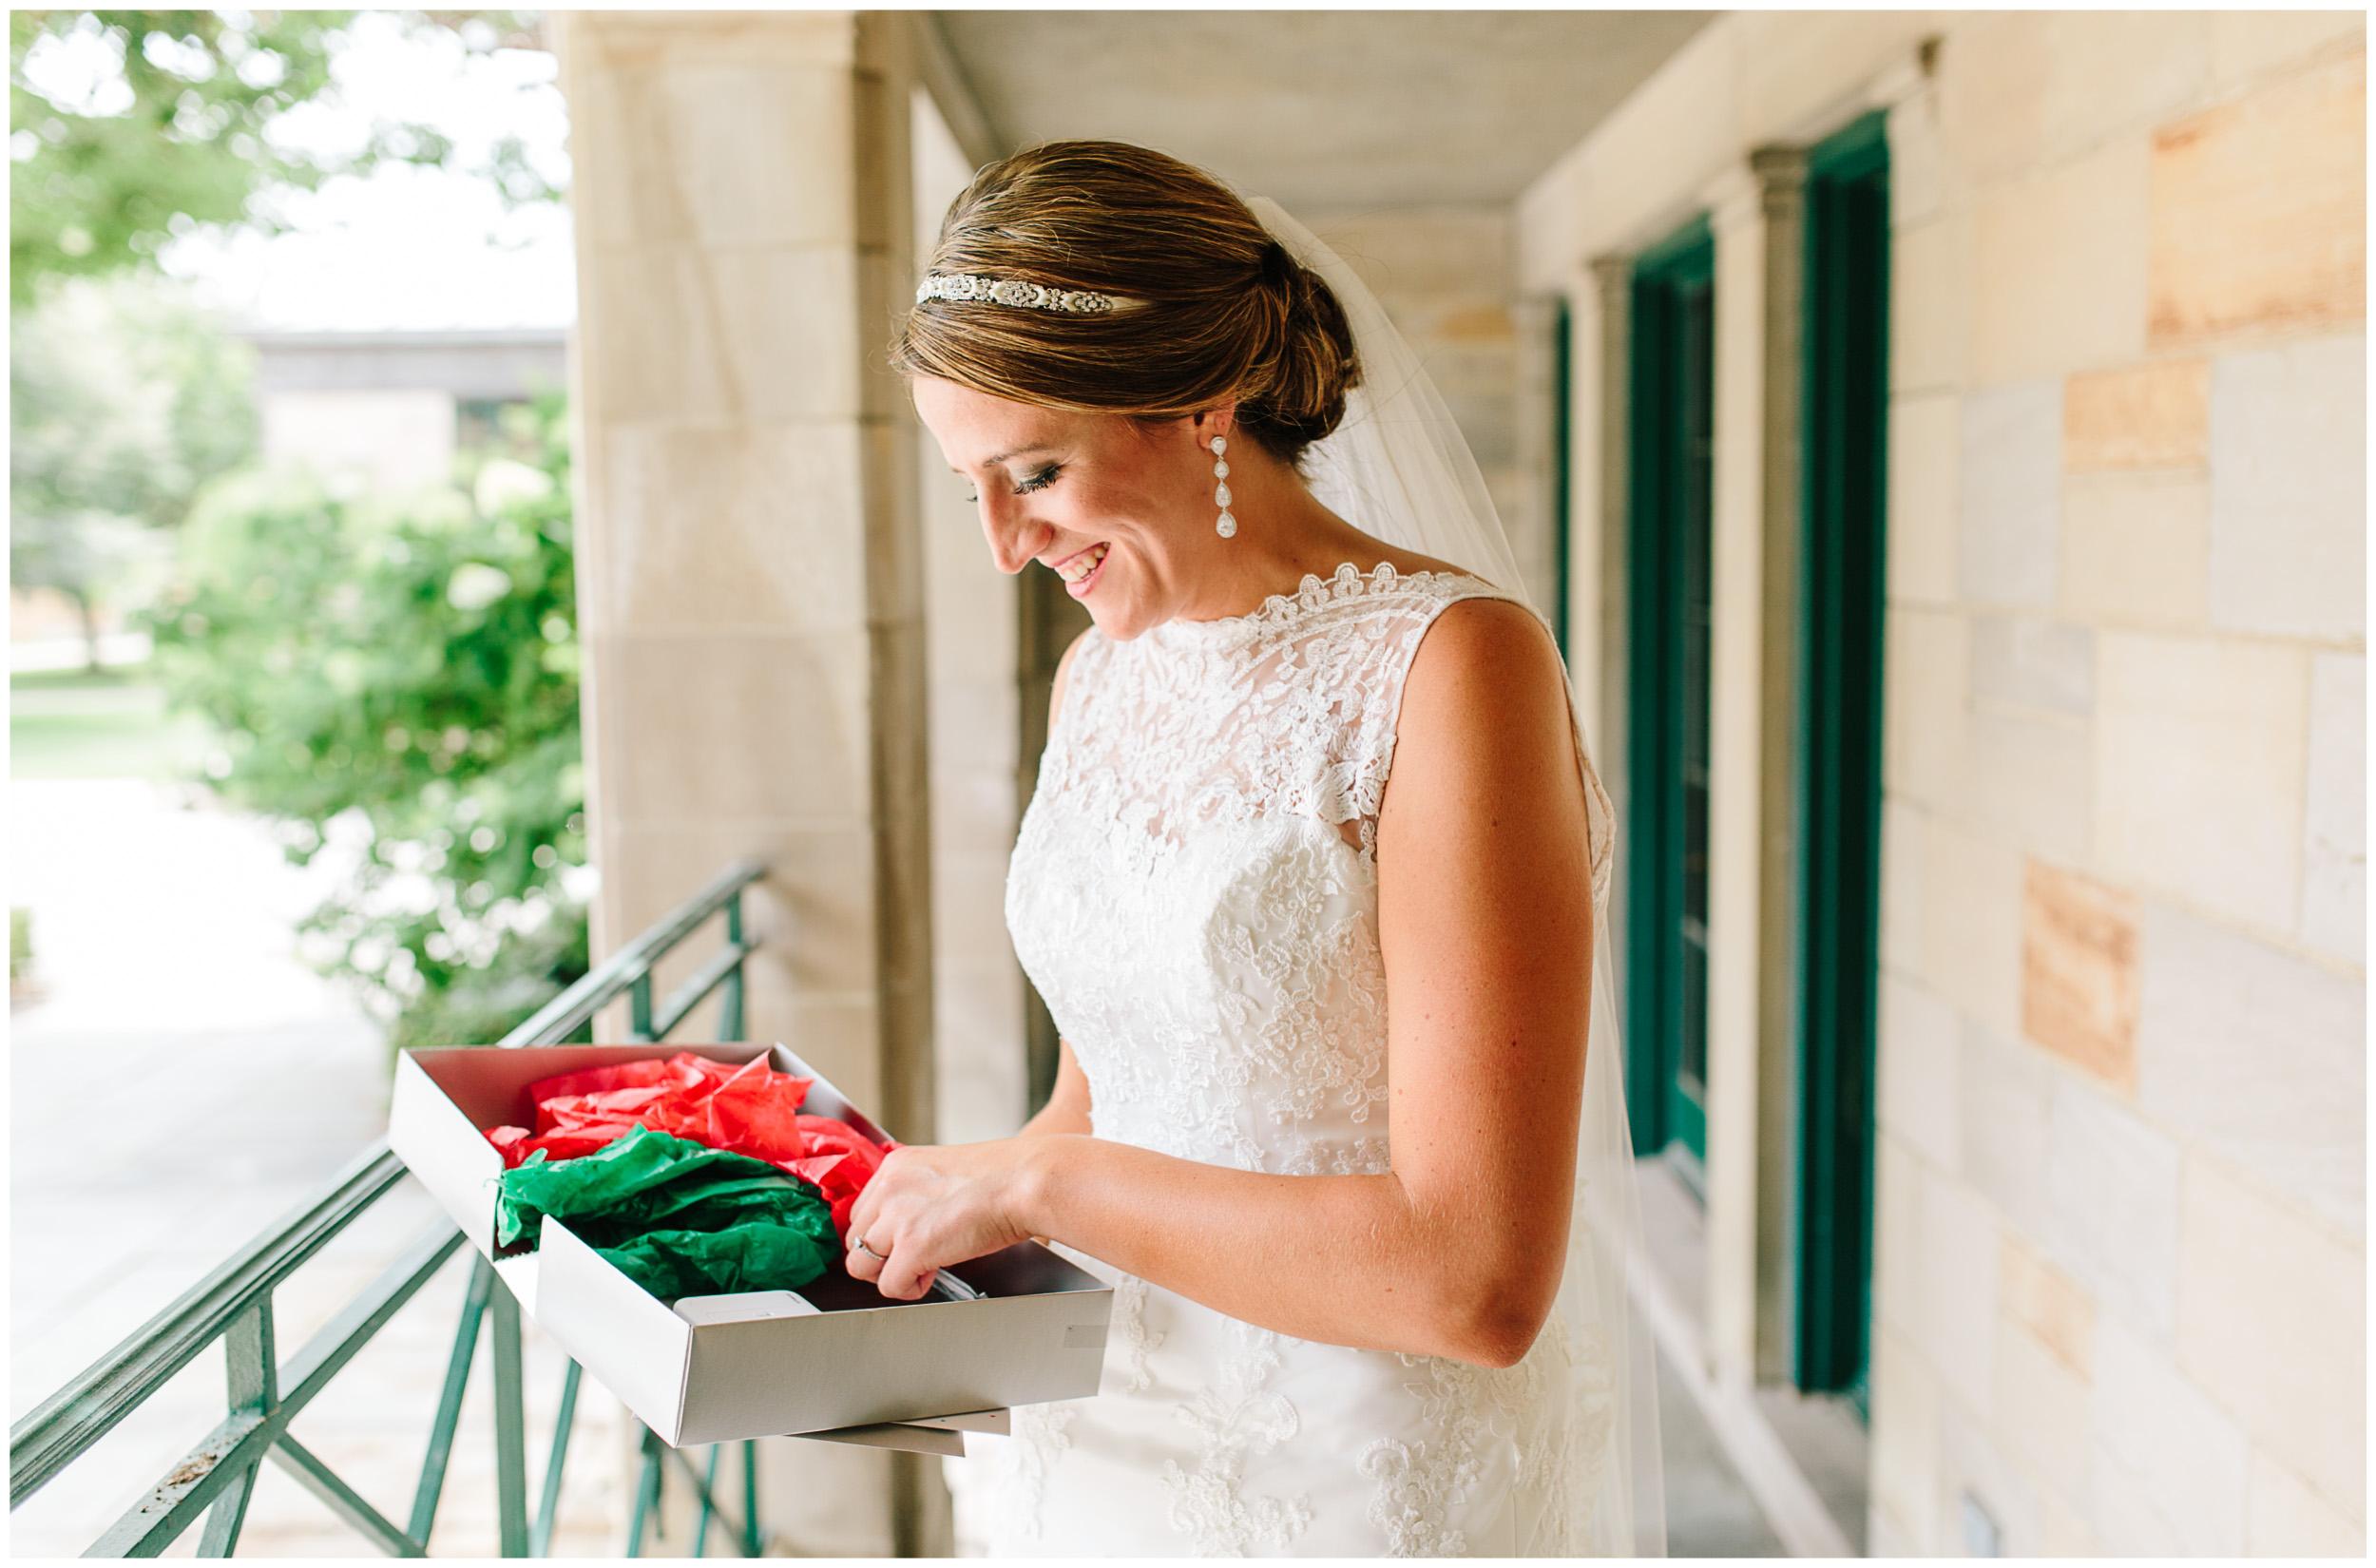 ann_arbor_michigan_wedding_22.jpg